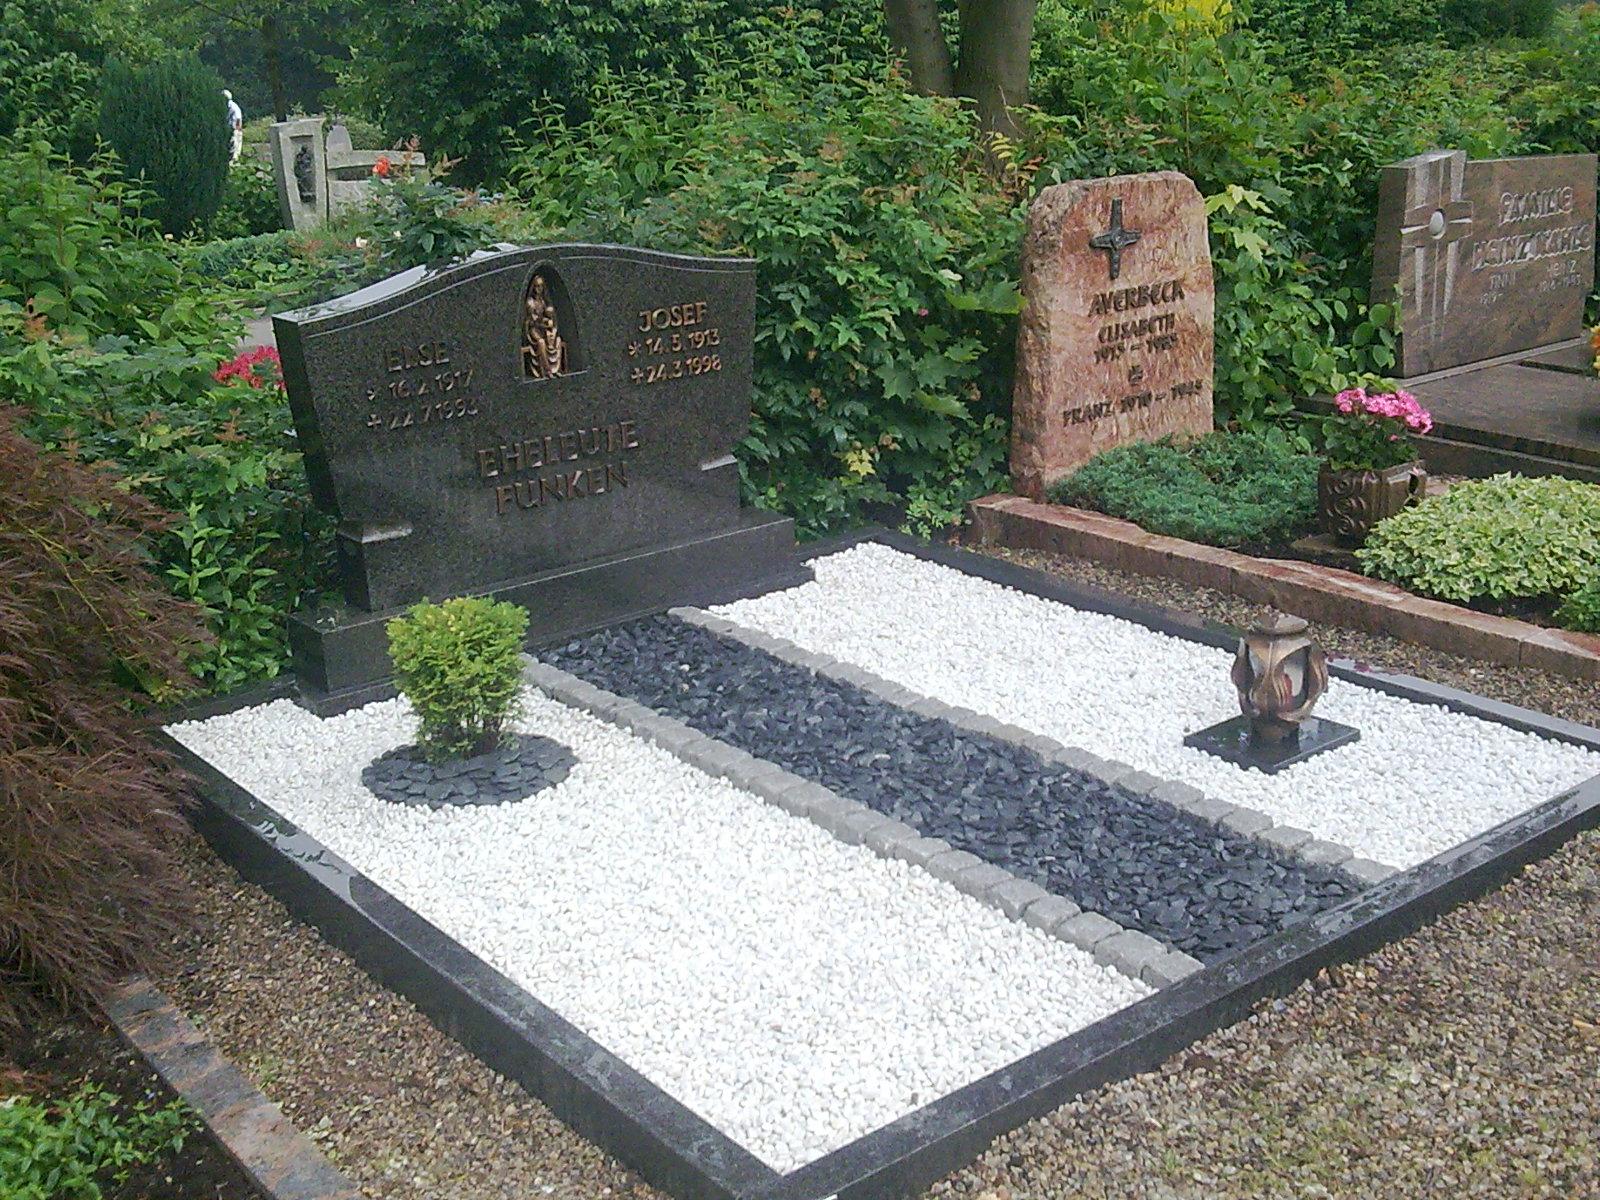 Moderne Grabgestalltung Asiatisch Gartenplanung Amp